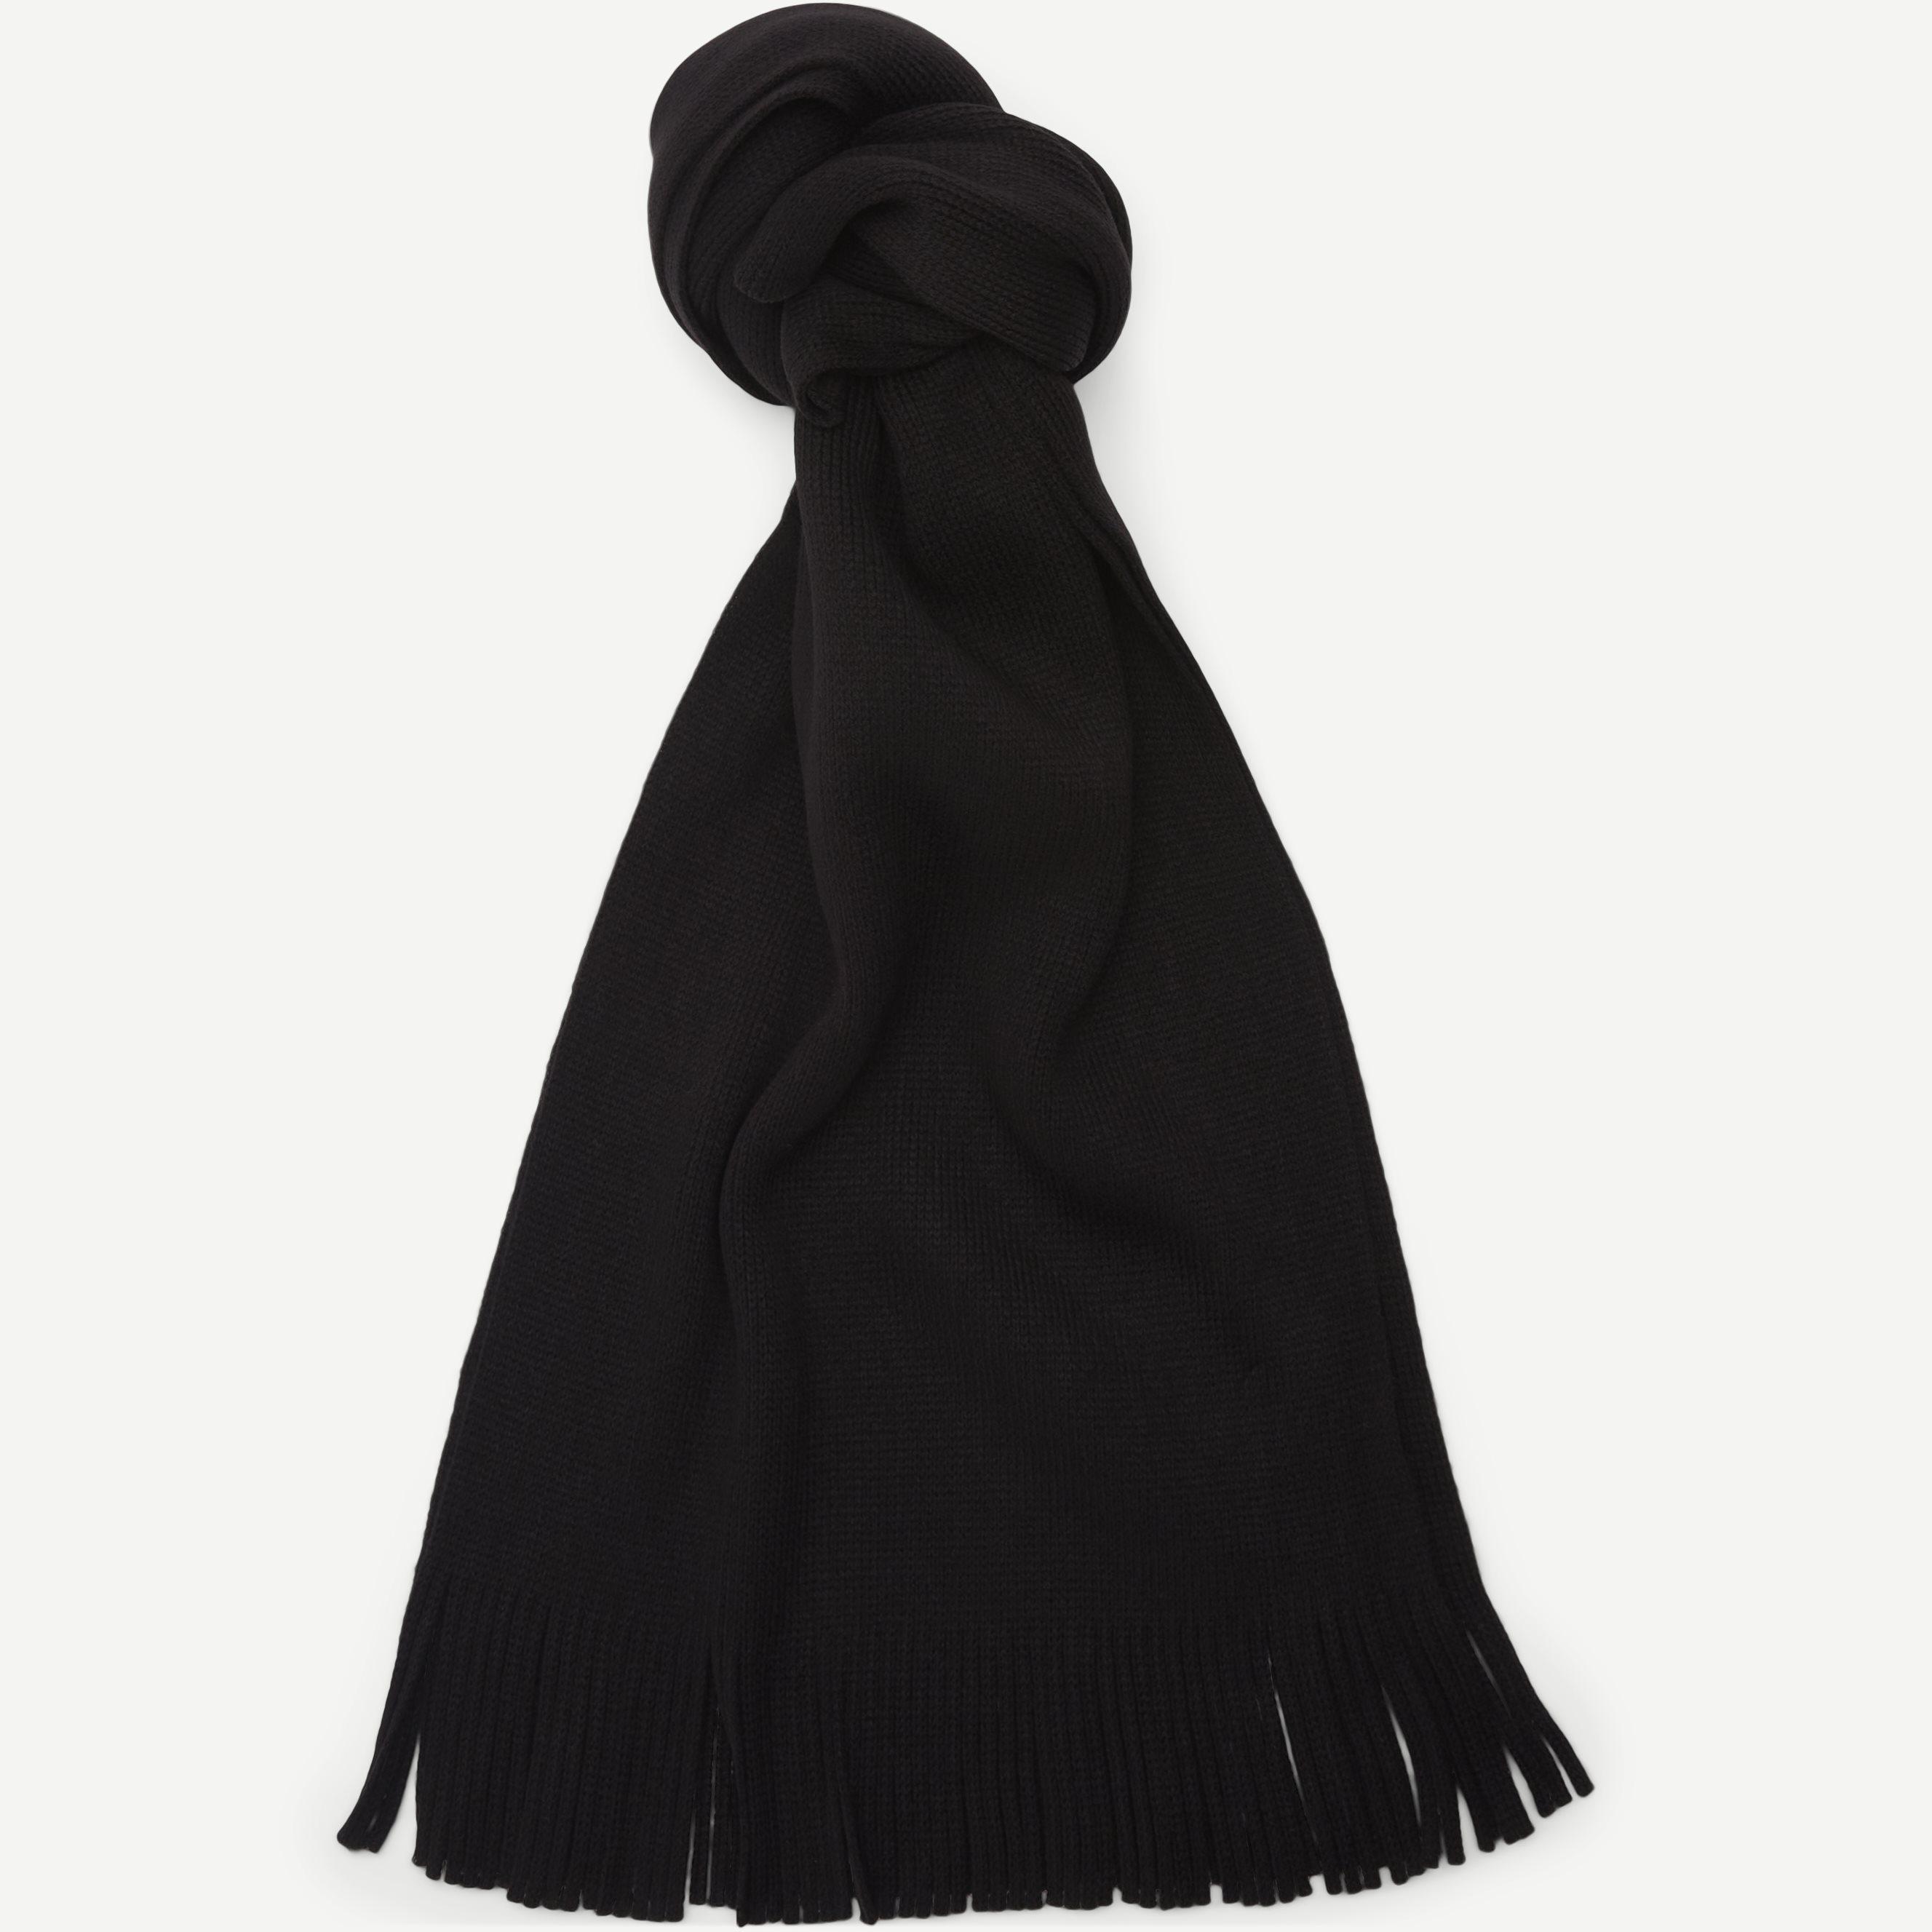 Tachov Tørklæde - Halsdukar - Svart